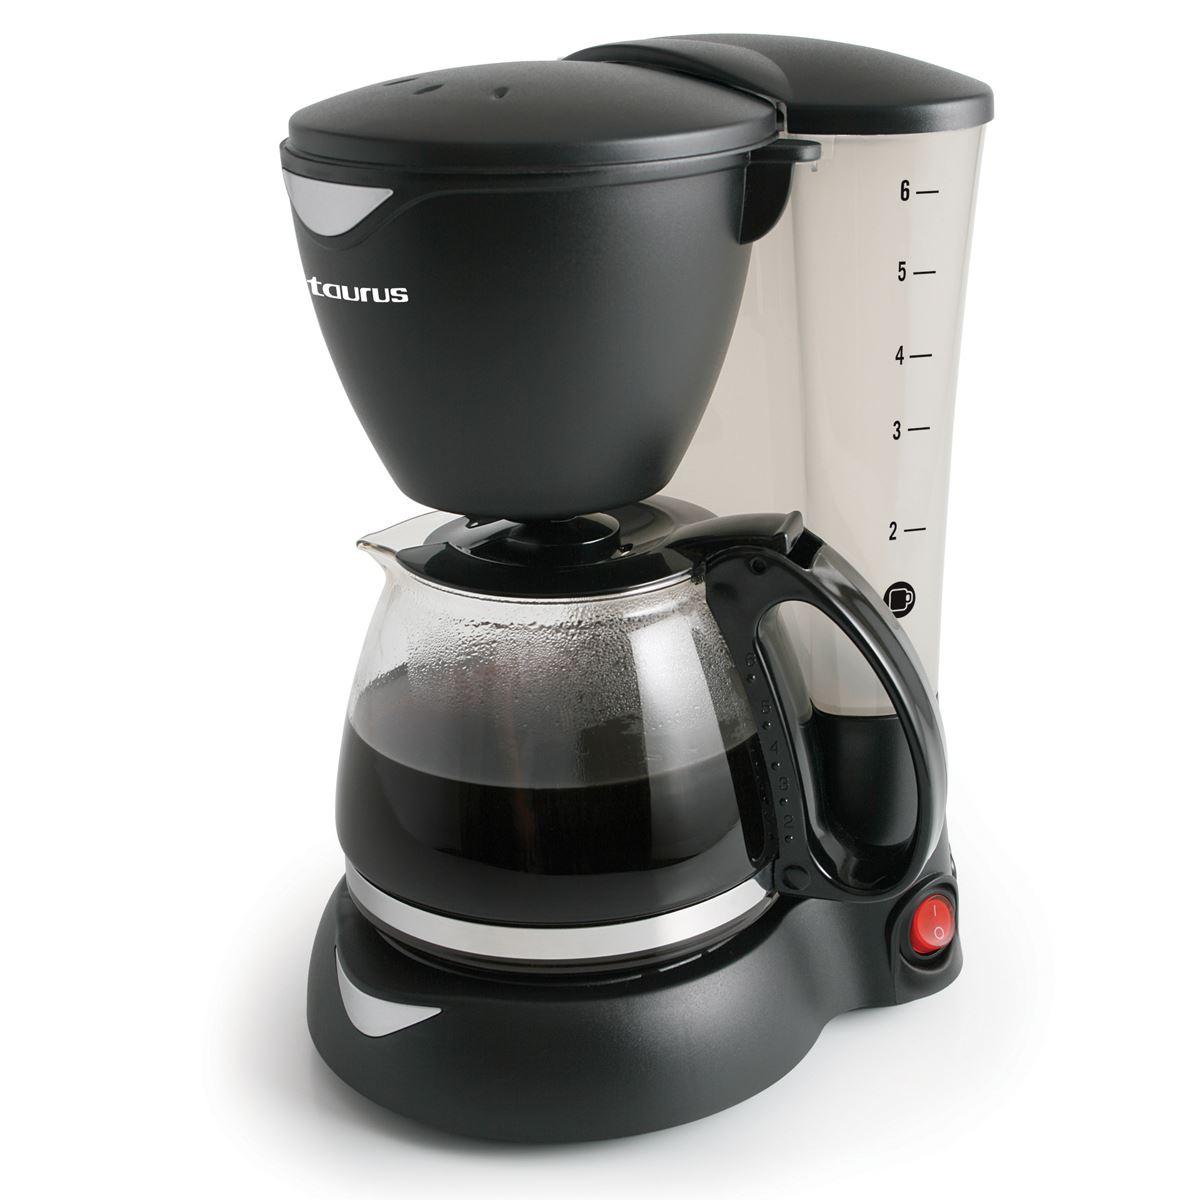 Cafetera Coffeemax 6 para 6 Tazas Taurus